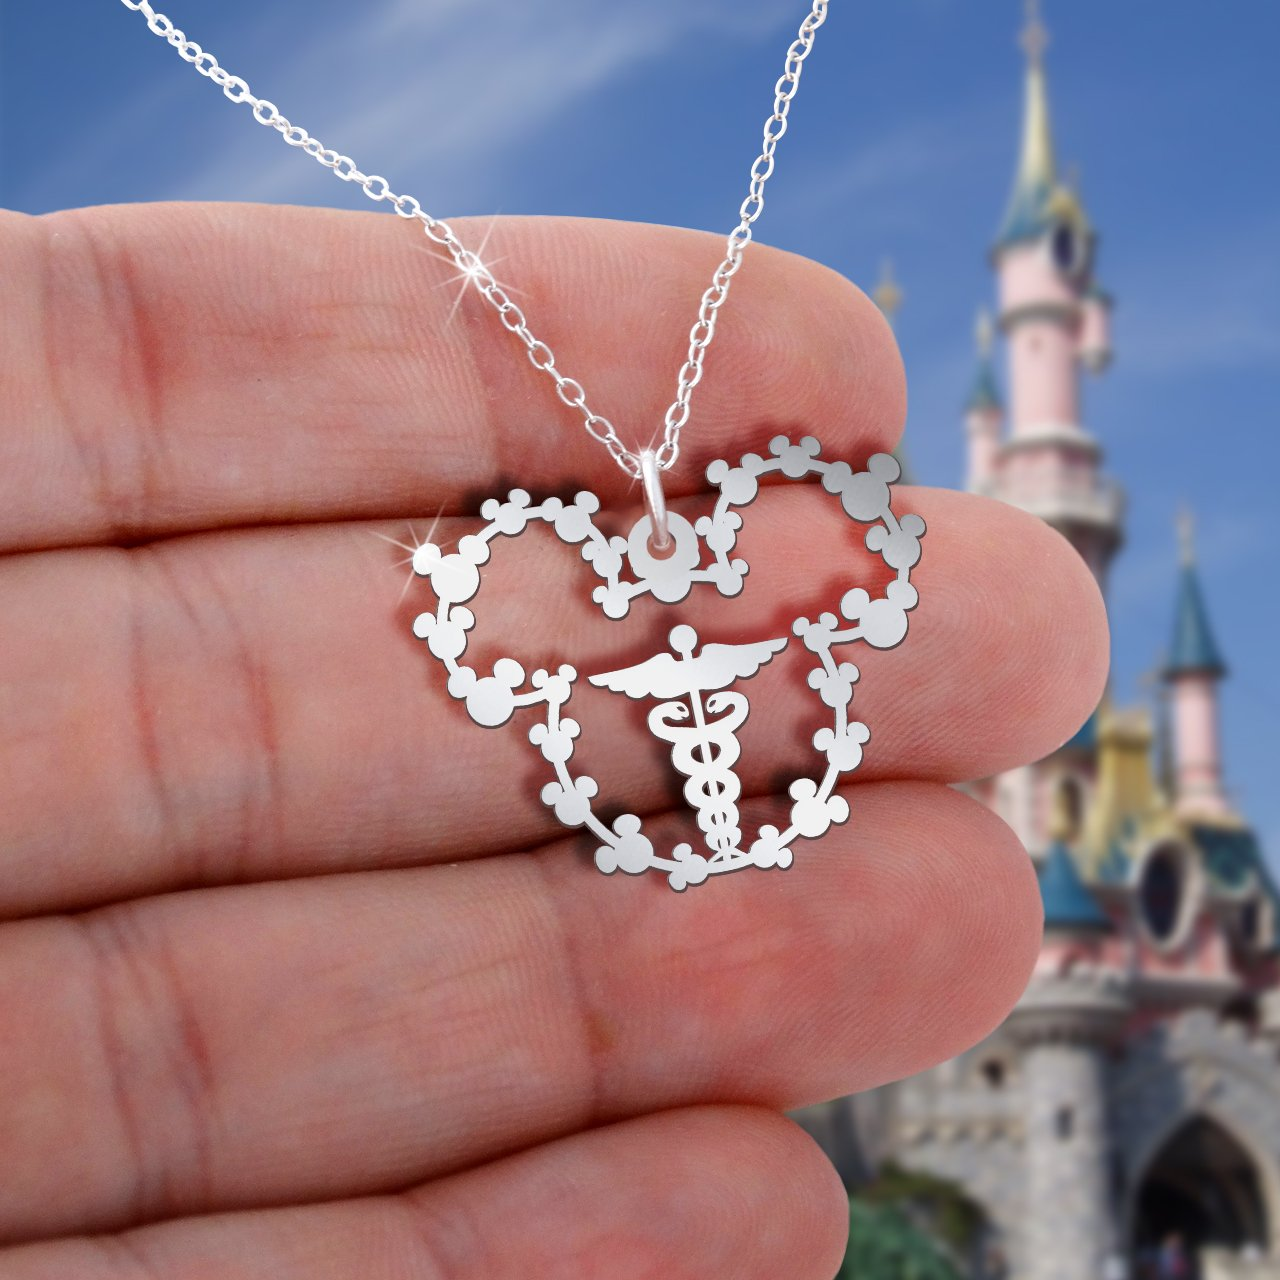 Caduceus Mickey Necklace